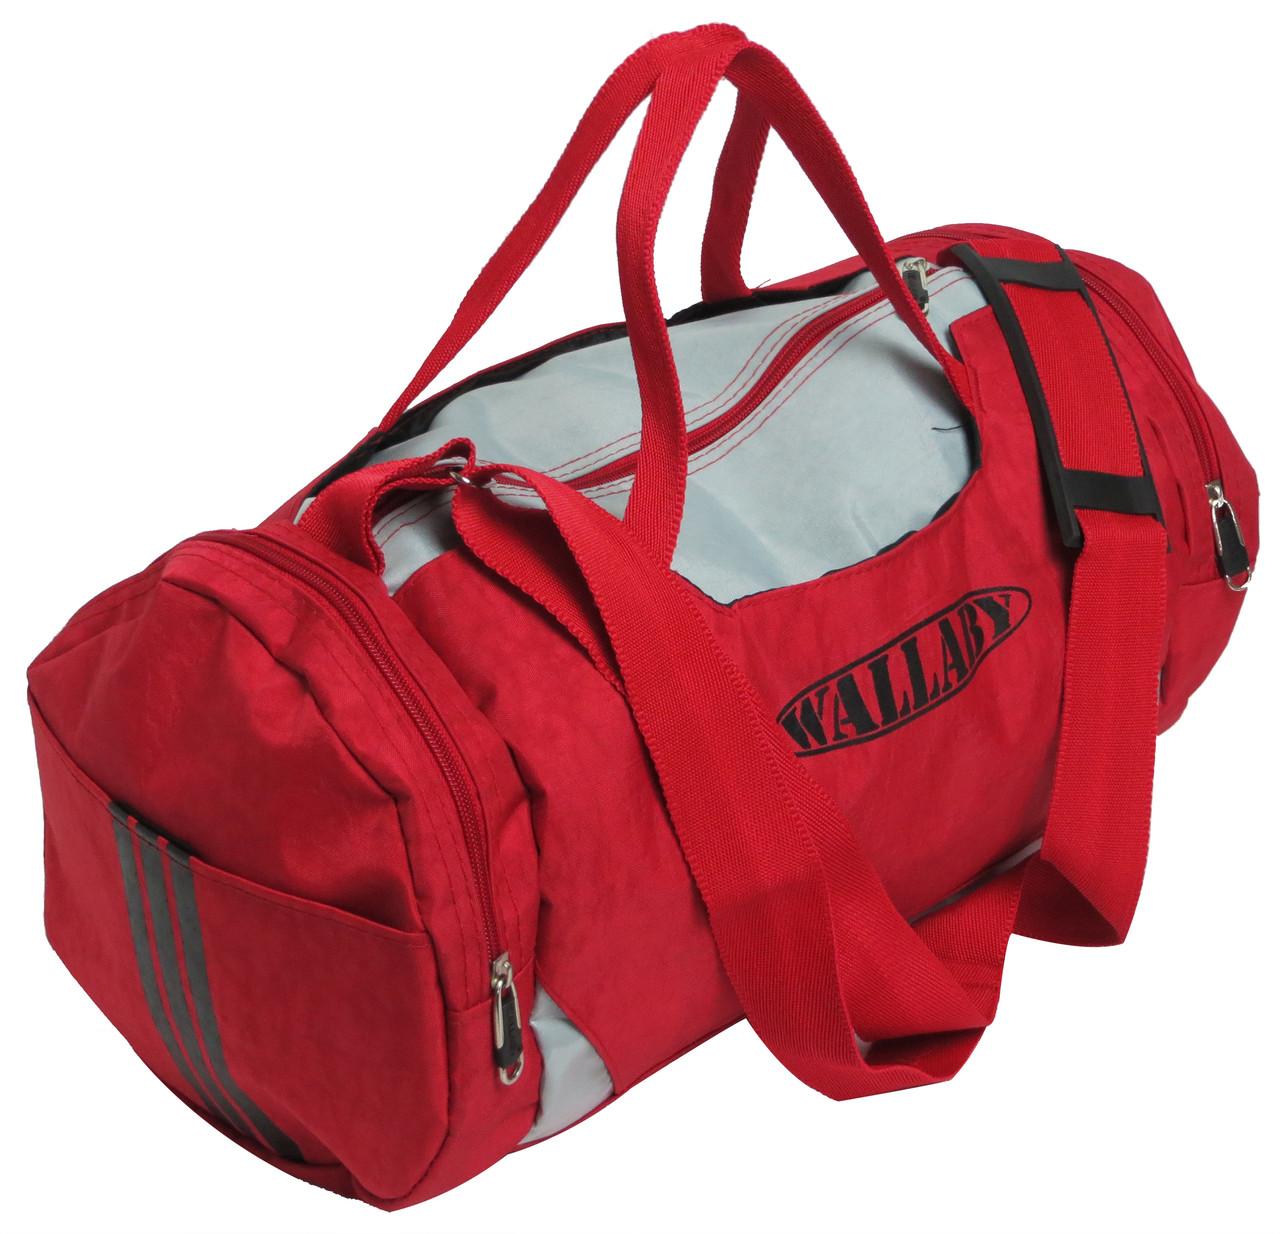 Сумка для спортзала Wallaby 216-1 (боченок), 20 л,  красная с серым